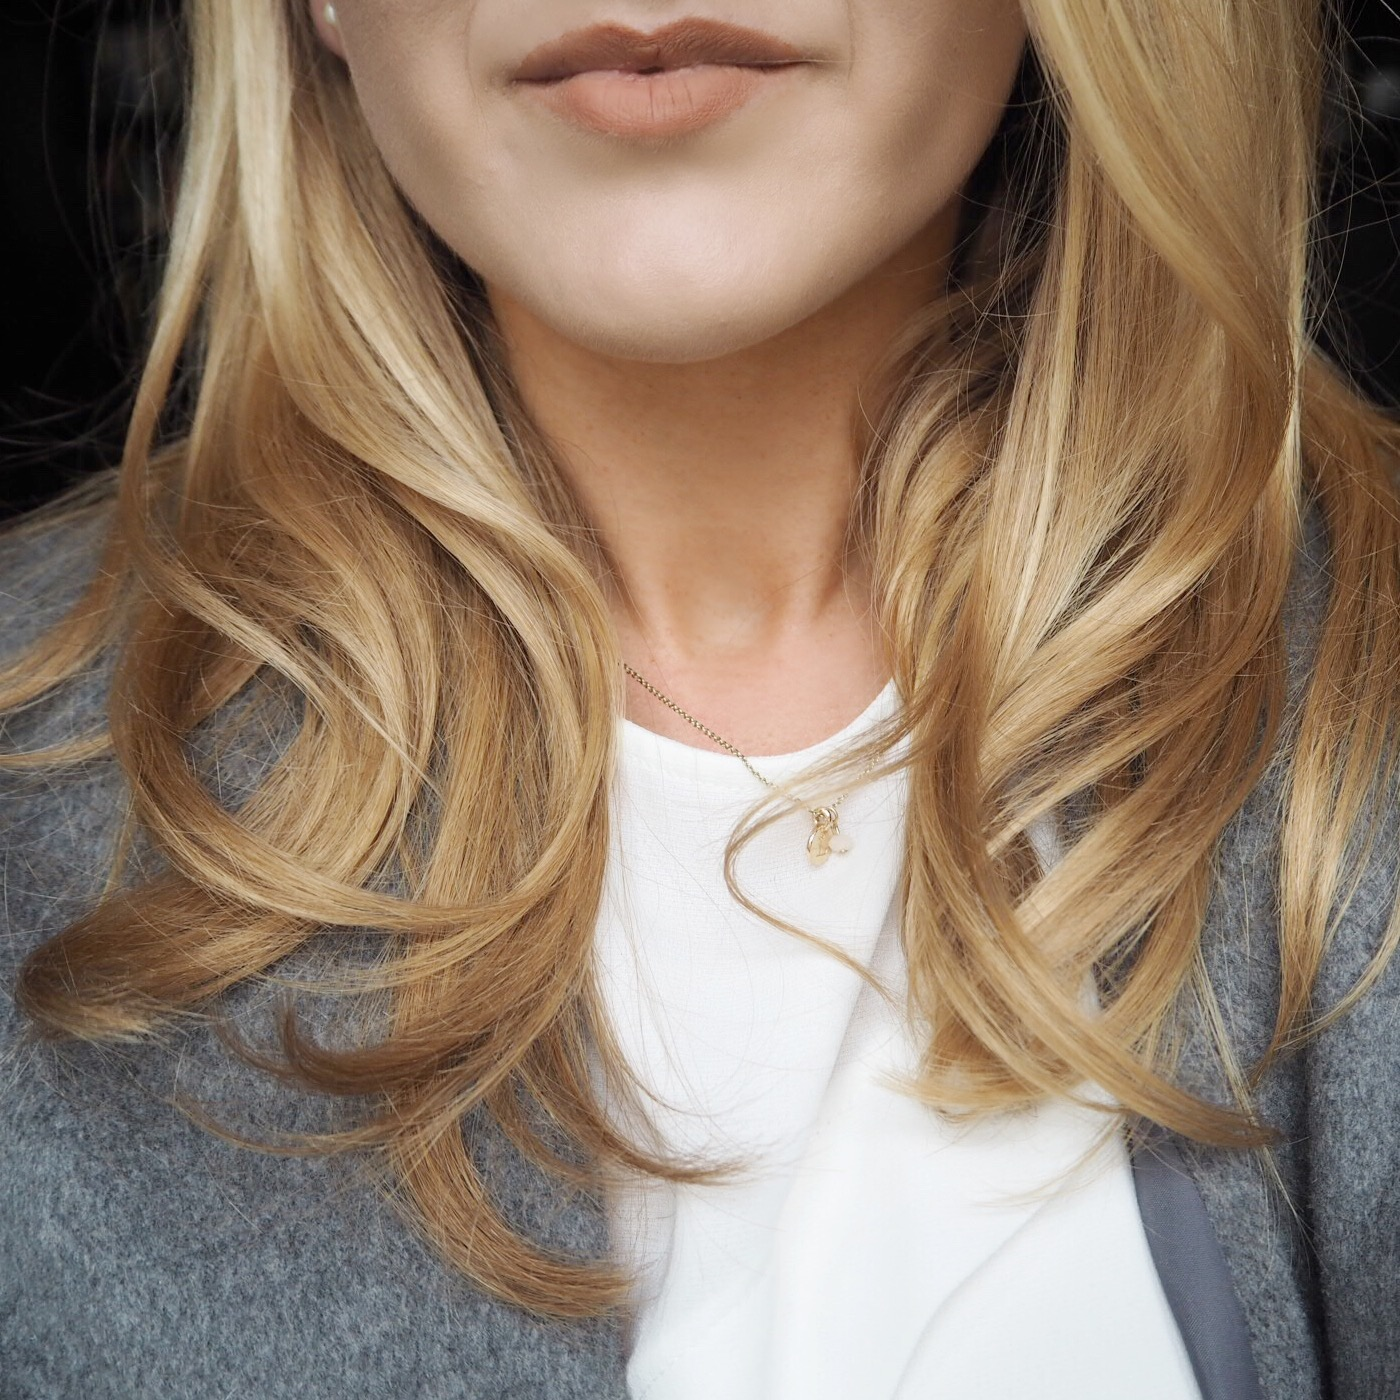 Blonde, blow dried hair